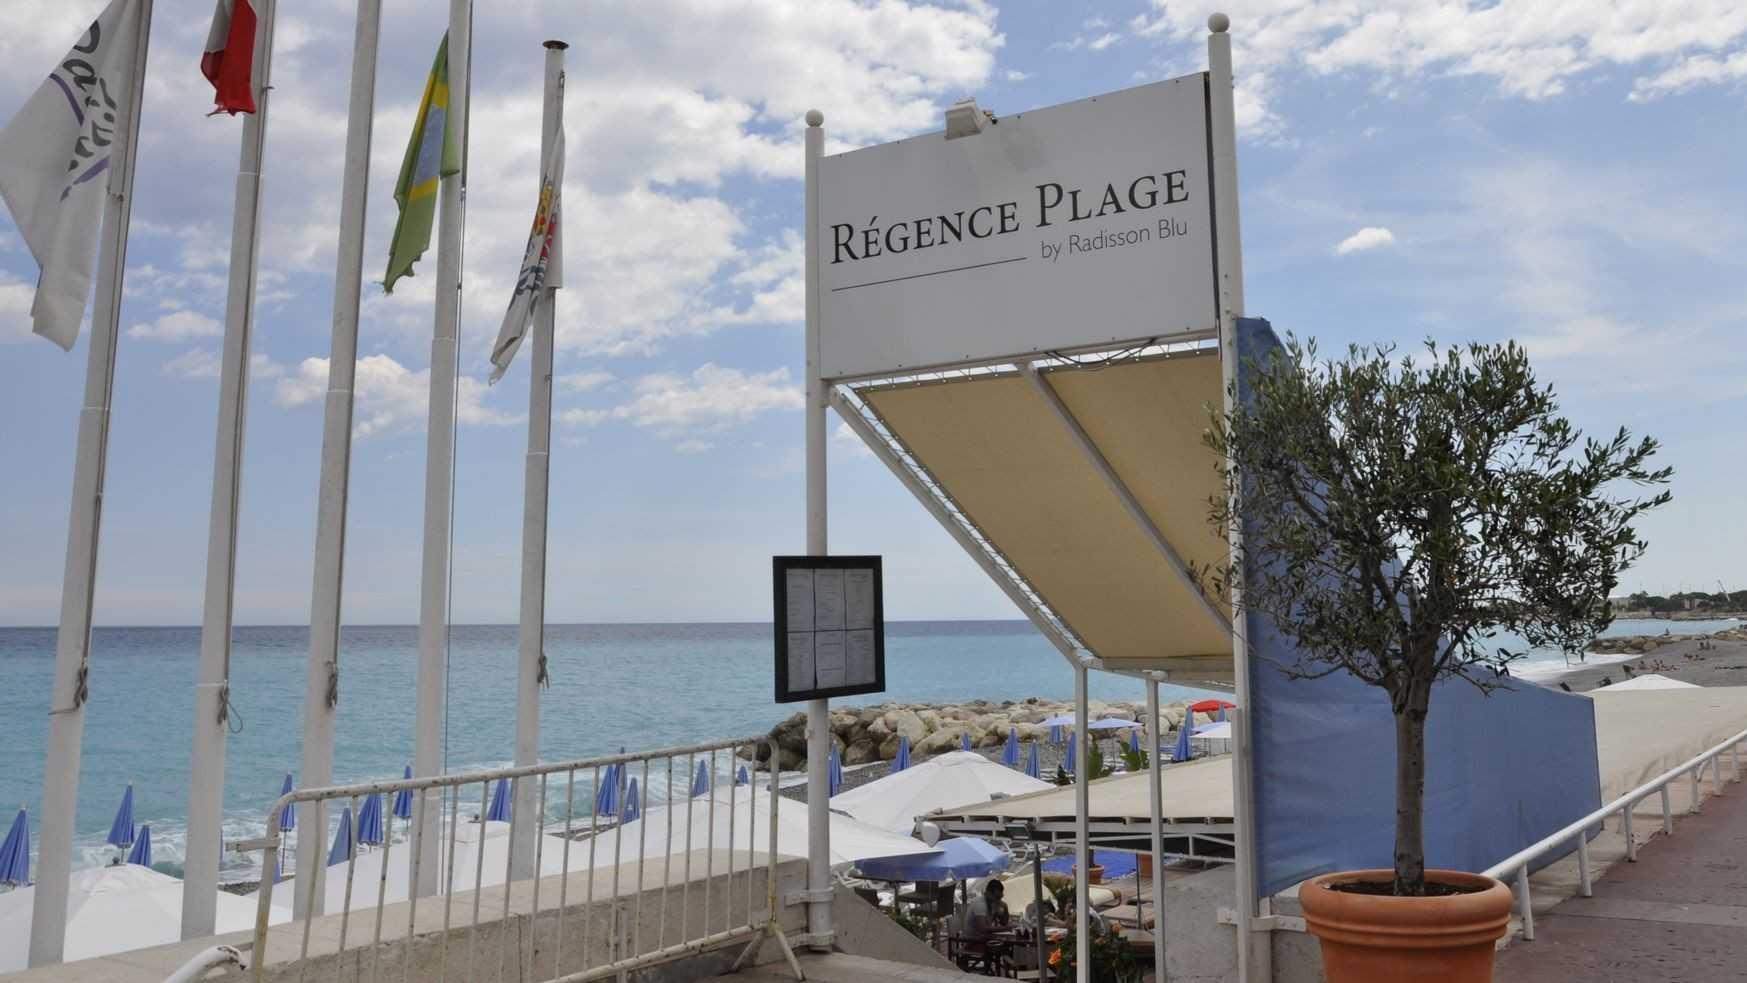 Nice - Régence Plage By Radisson Blu